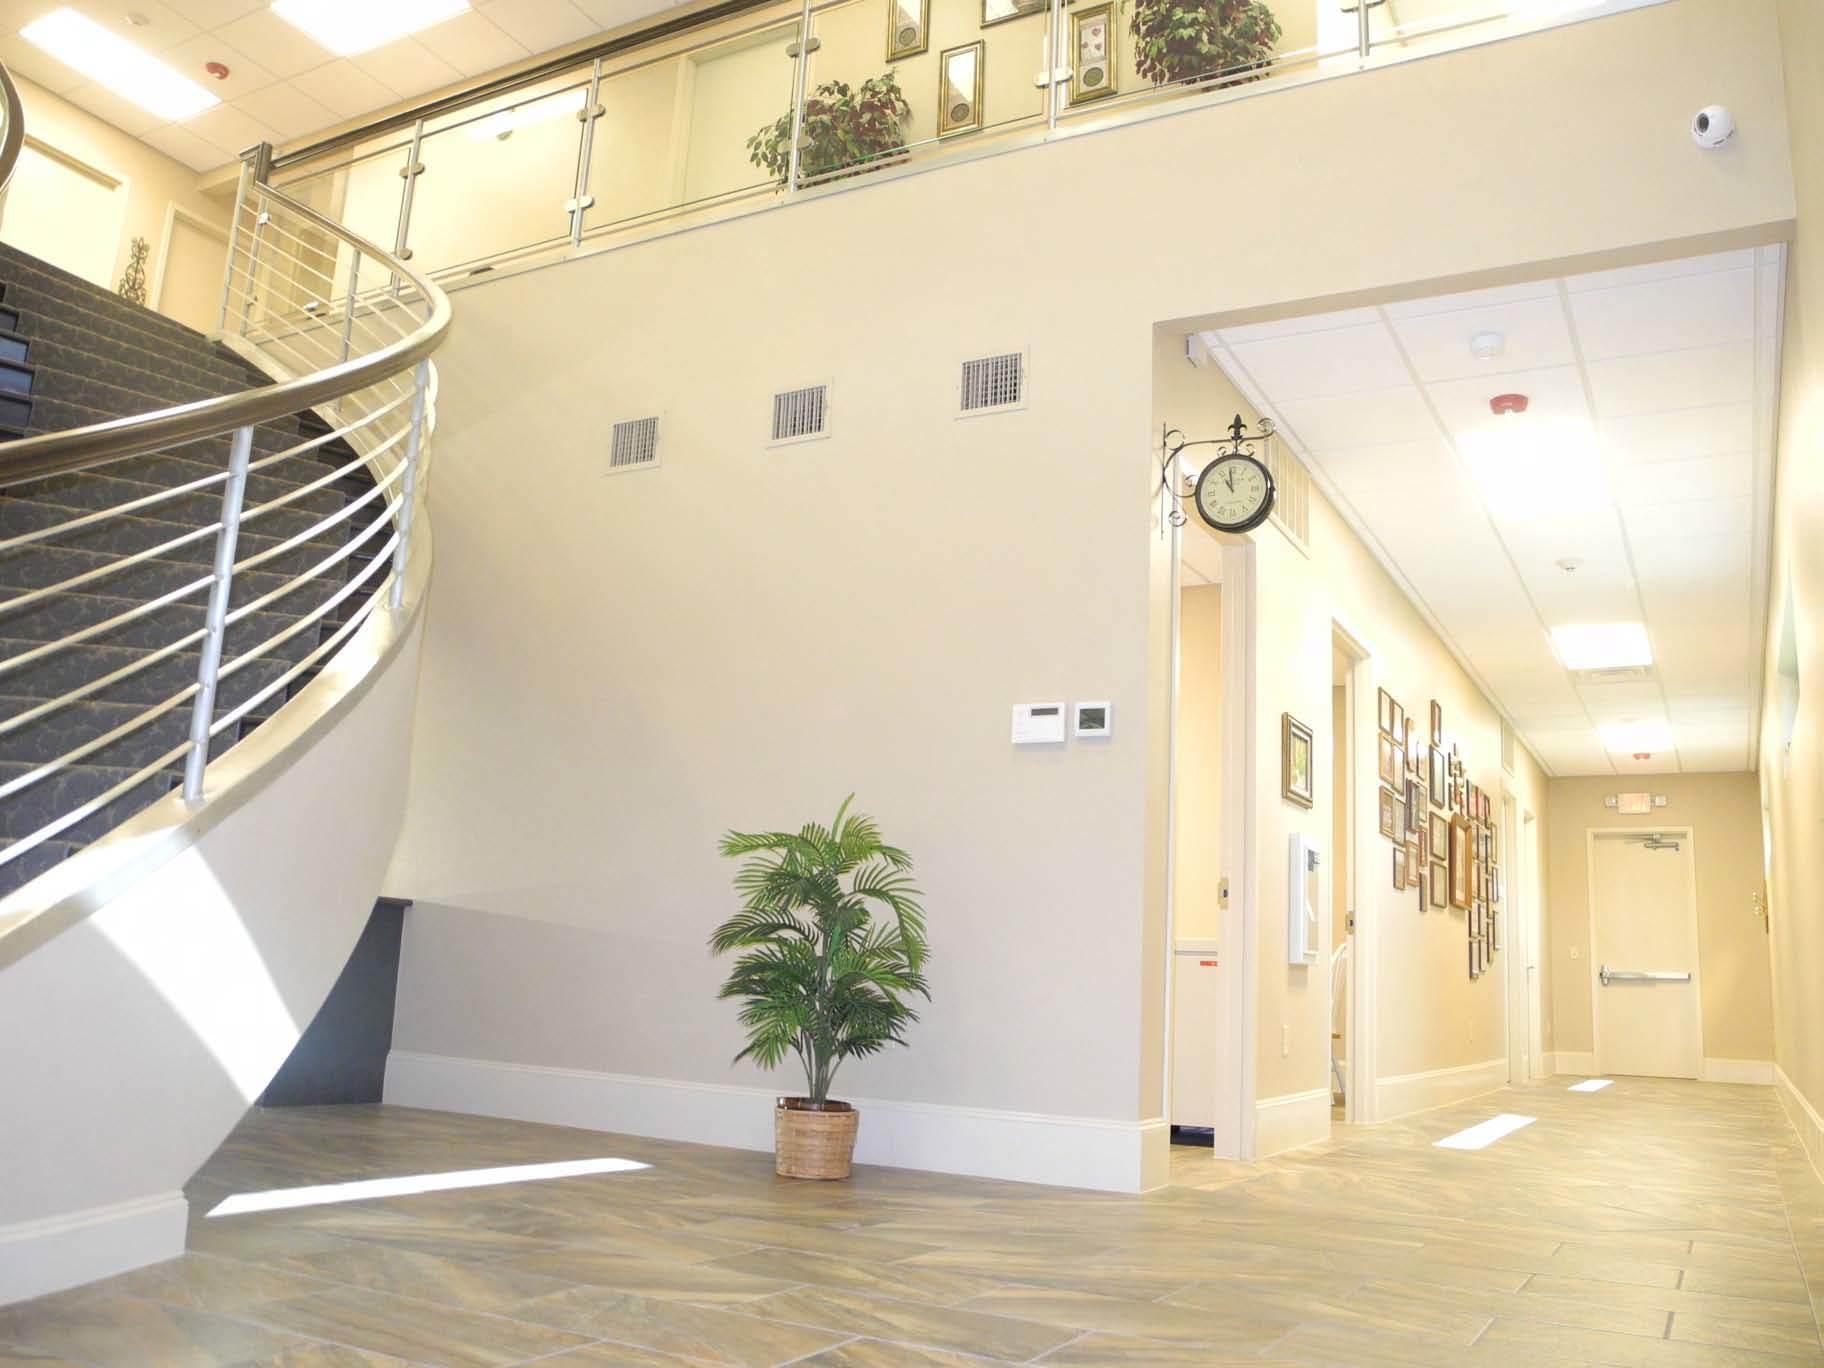 Lobby space